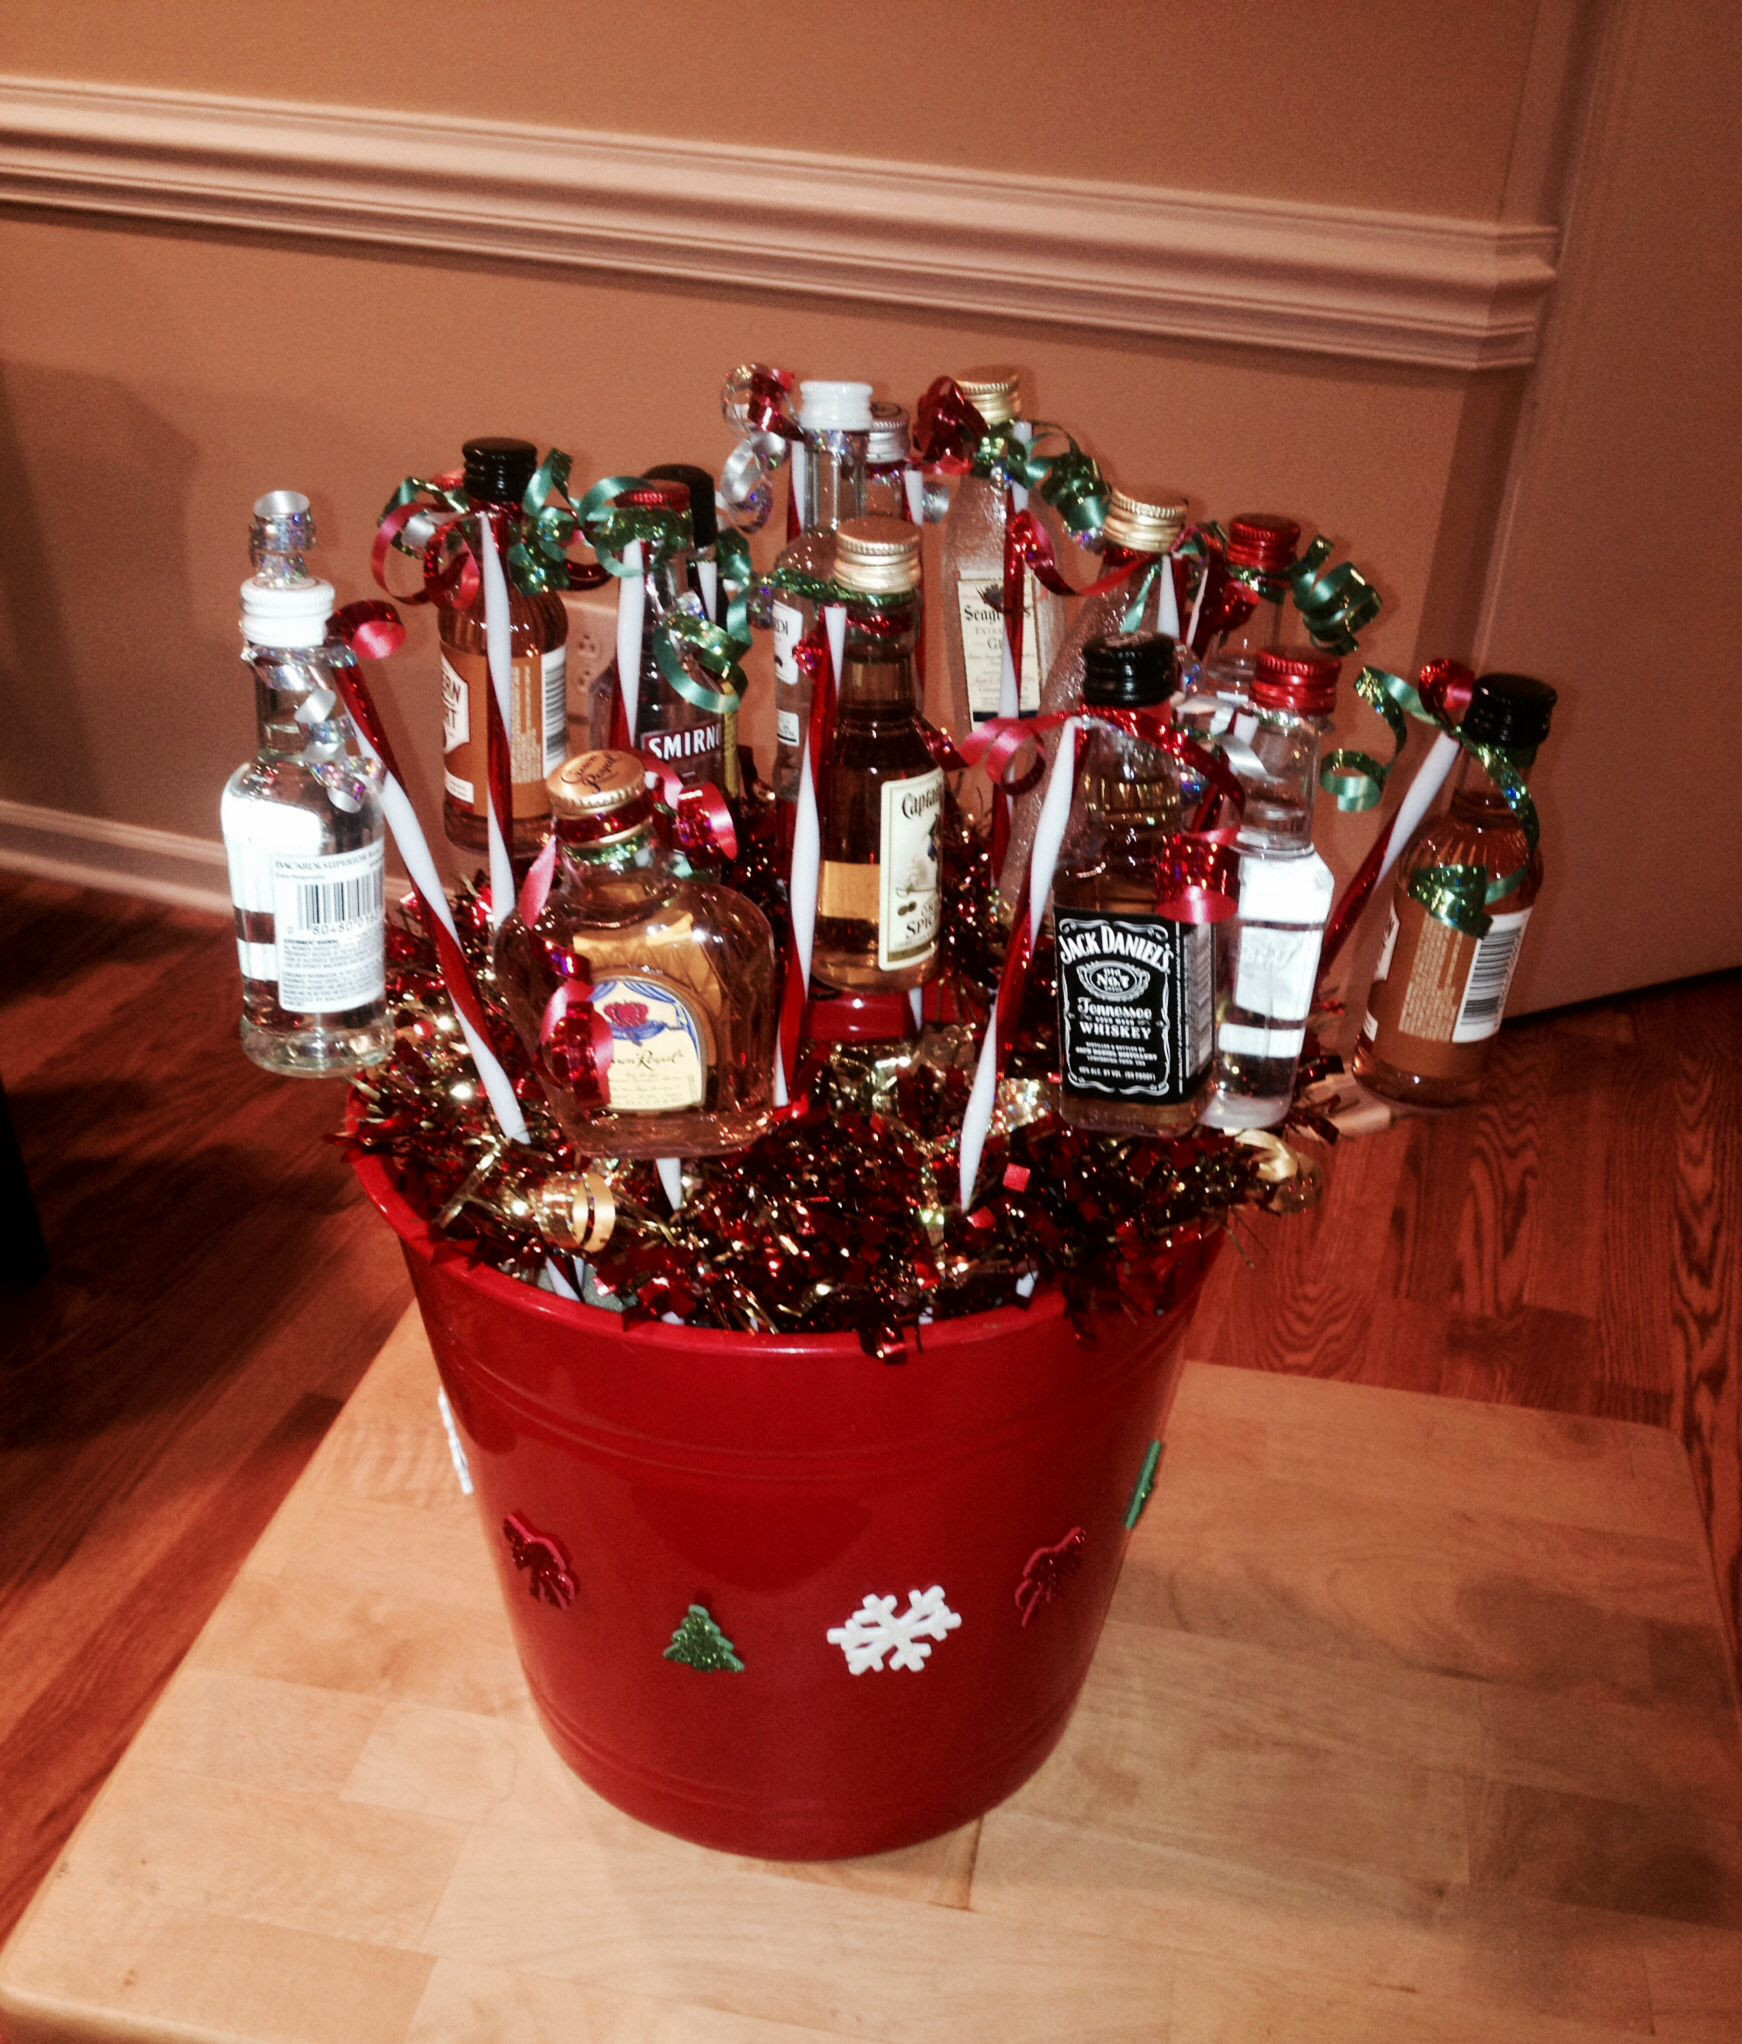 Best ideas about Mini Liquor Bottle Gift Ideas . Save or Pin Christmas mini liquor bottle basket Super easy and cheap Now.